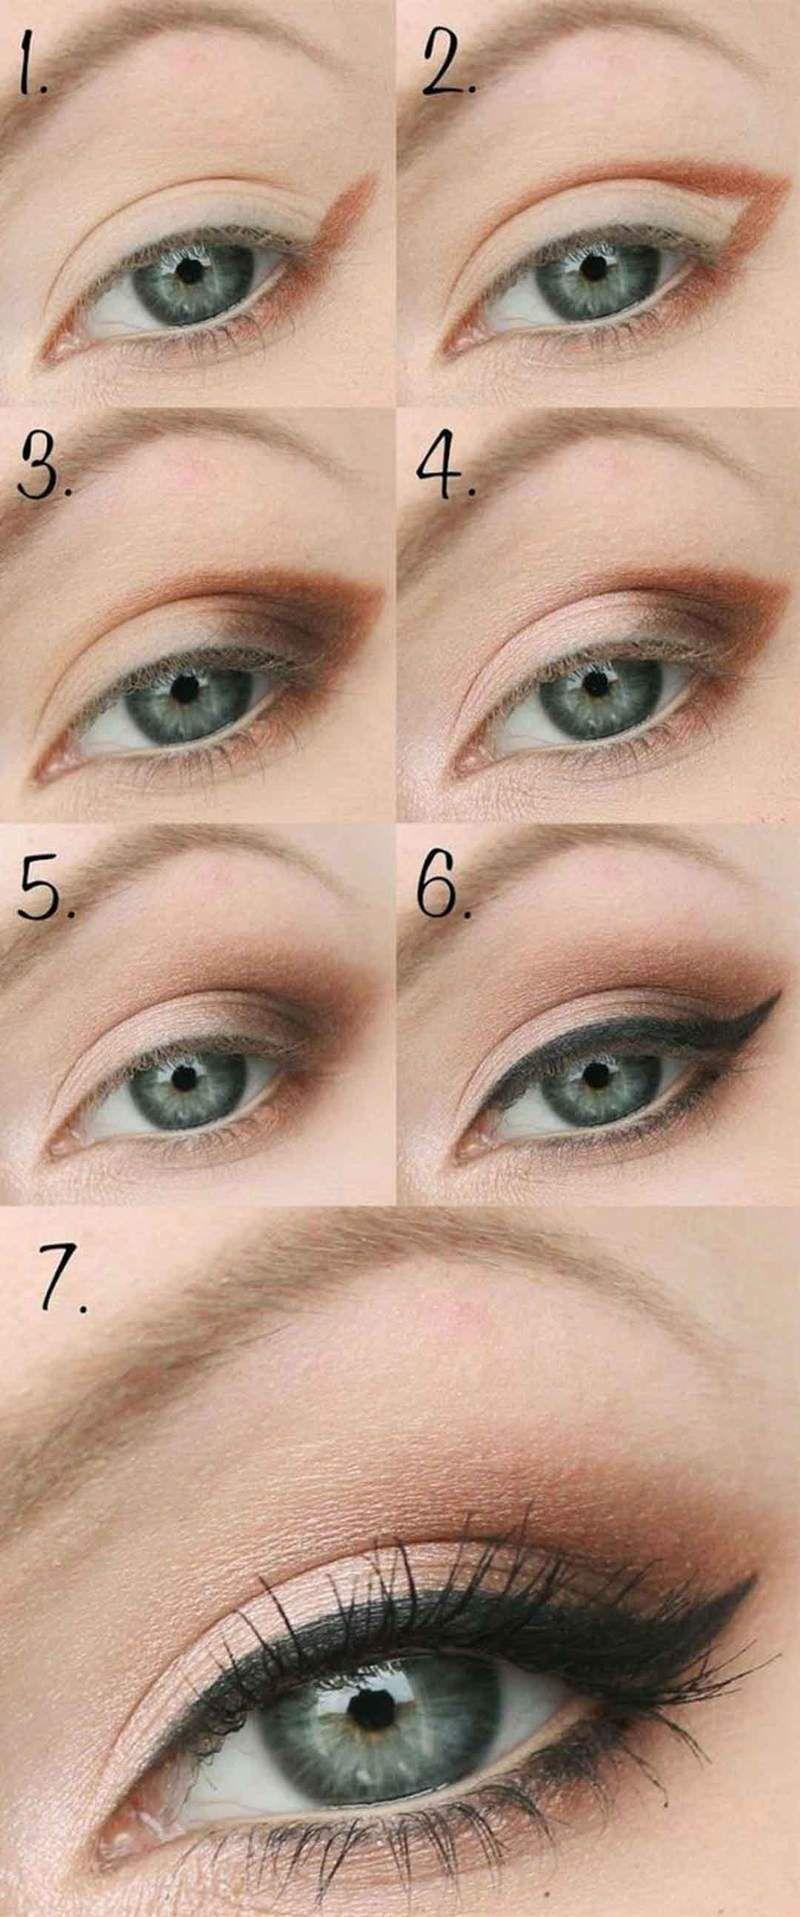 maquillaje natural con delineado paso a paso - Como Maquillarse Paso A Paso